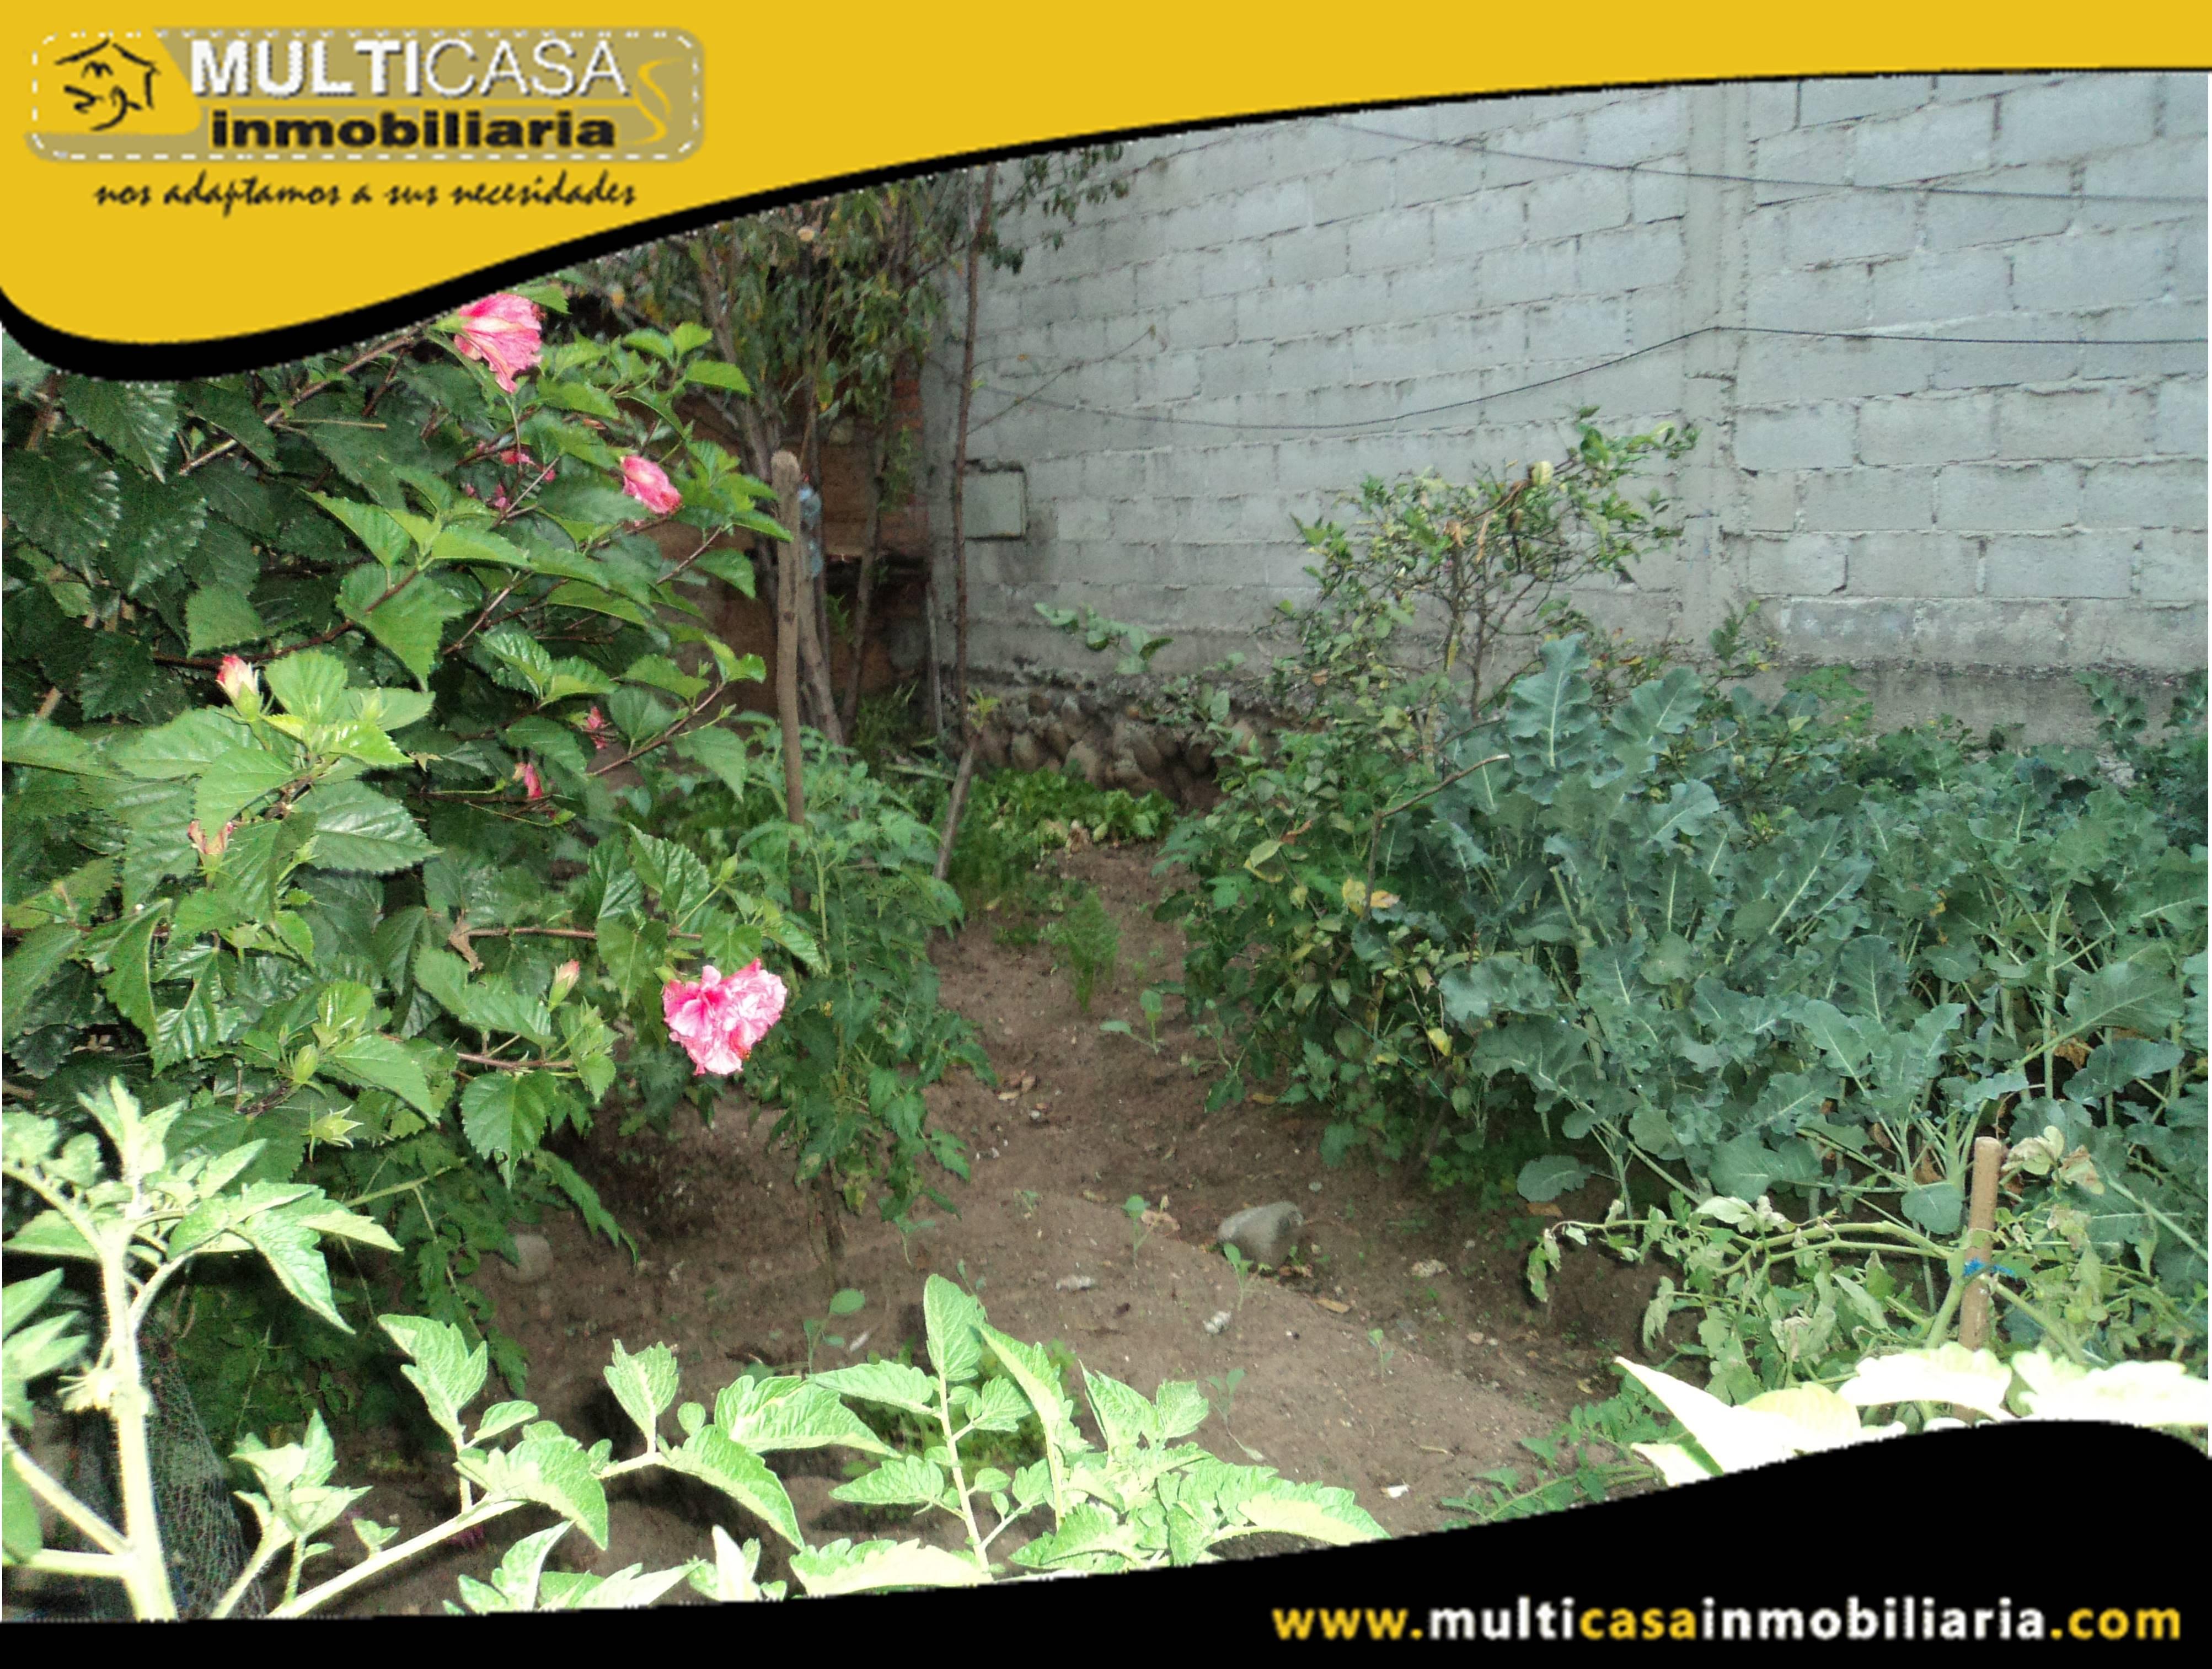 Terreno en Venta a Crédito residencial Sector Machangara Cuenca-Ecuador